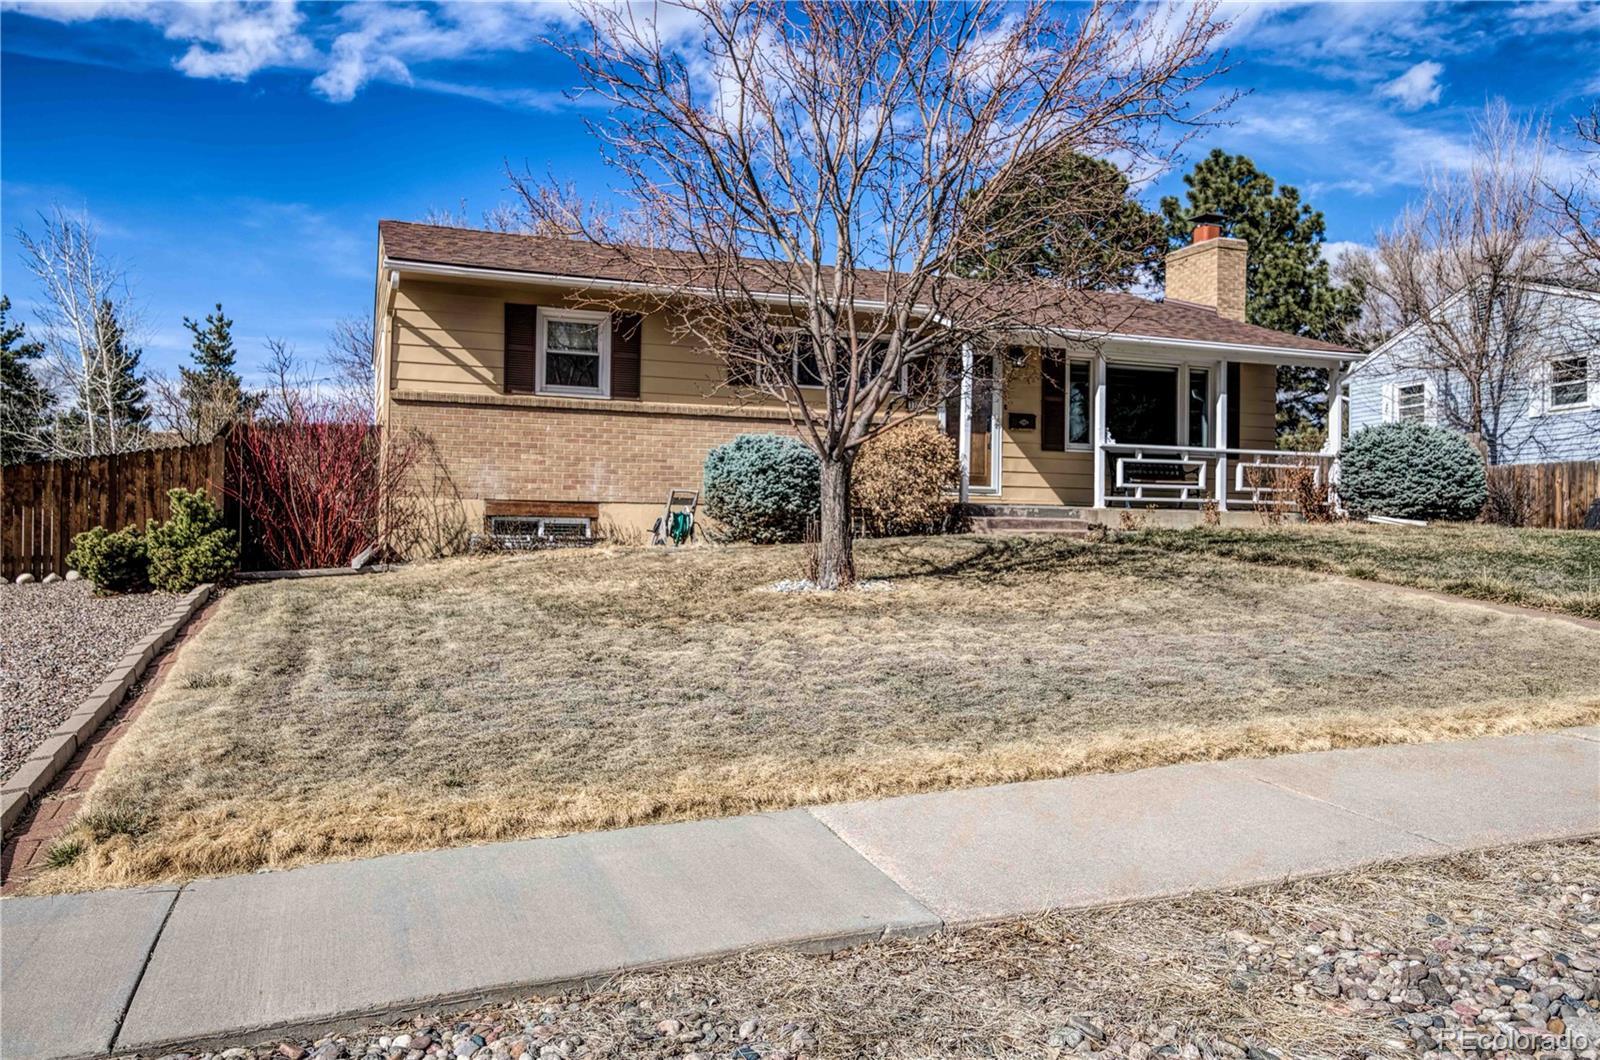 MLS# 5043109 - 2 - 1832 Northview Drive, Colorado Springs, CO 80909